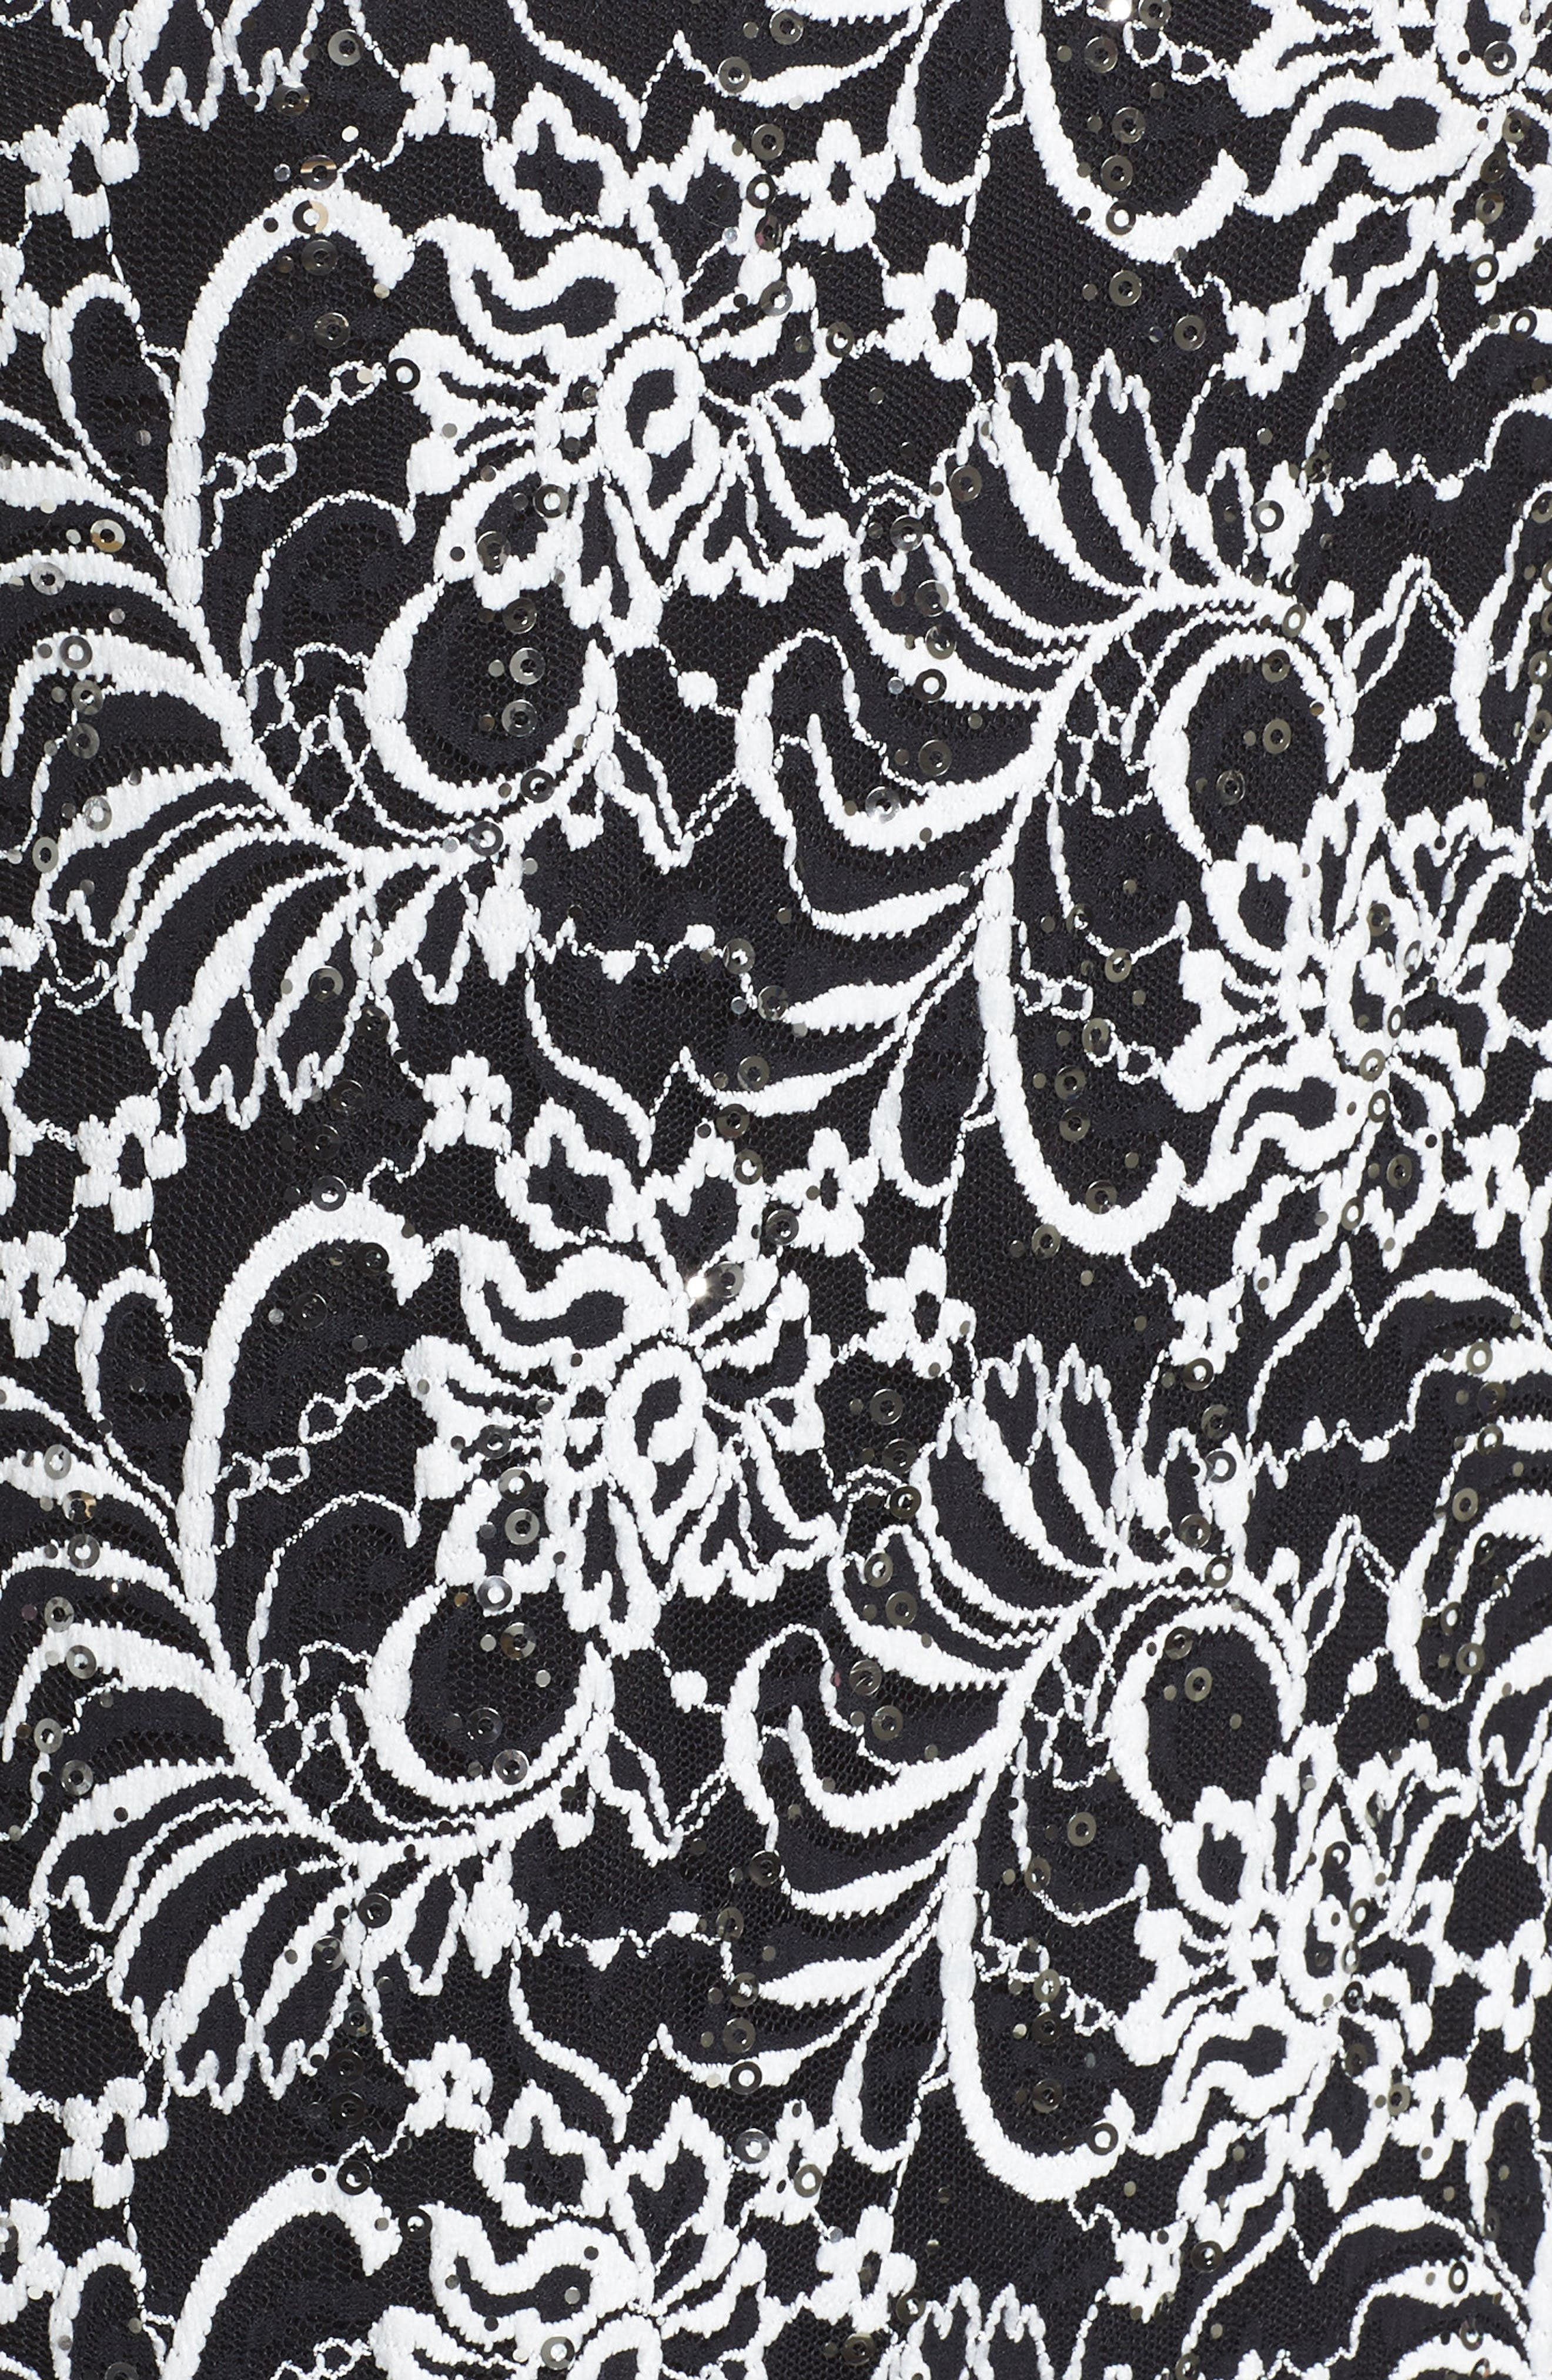 Embroidered Tulle Blouse,                             Alternate thumbnail 5, color,                             Black/ White